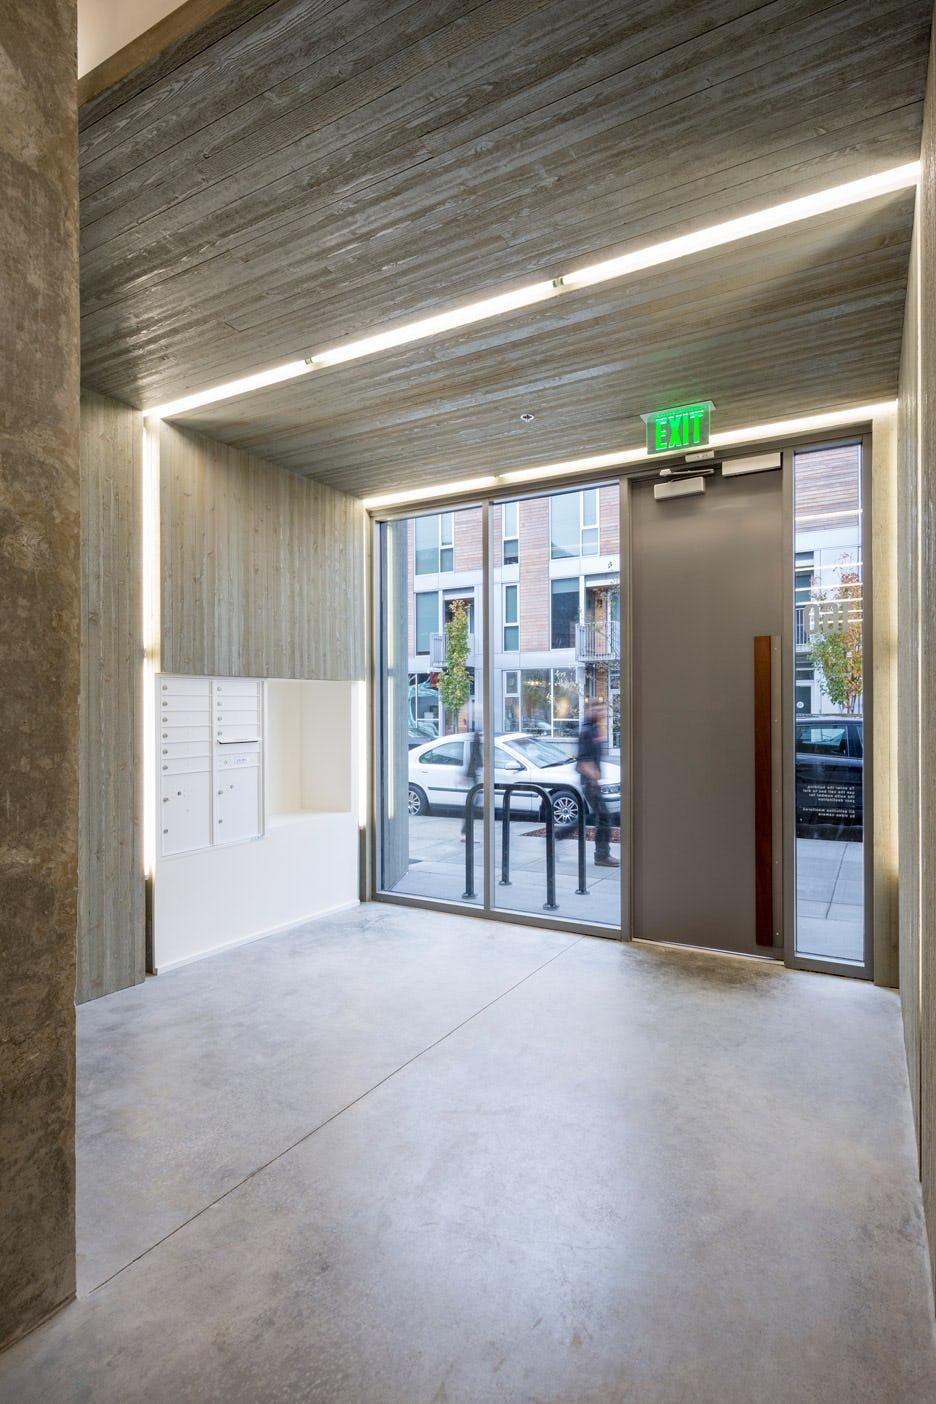 Framework worksarchitecture portland oregon usa cross laminated timber office building dezeen 936 10